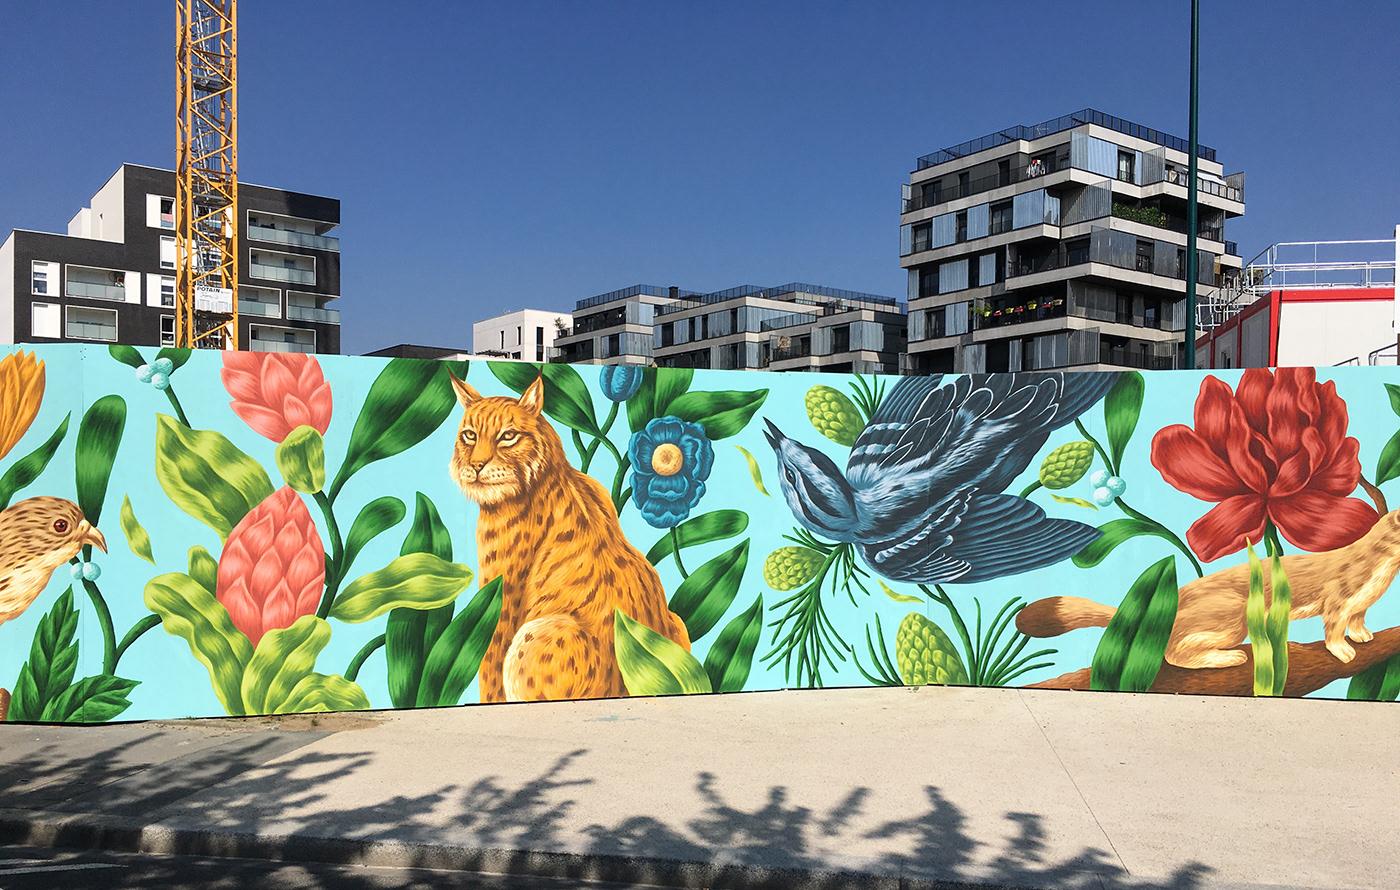 saddo colorful mural